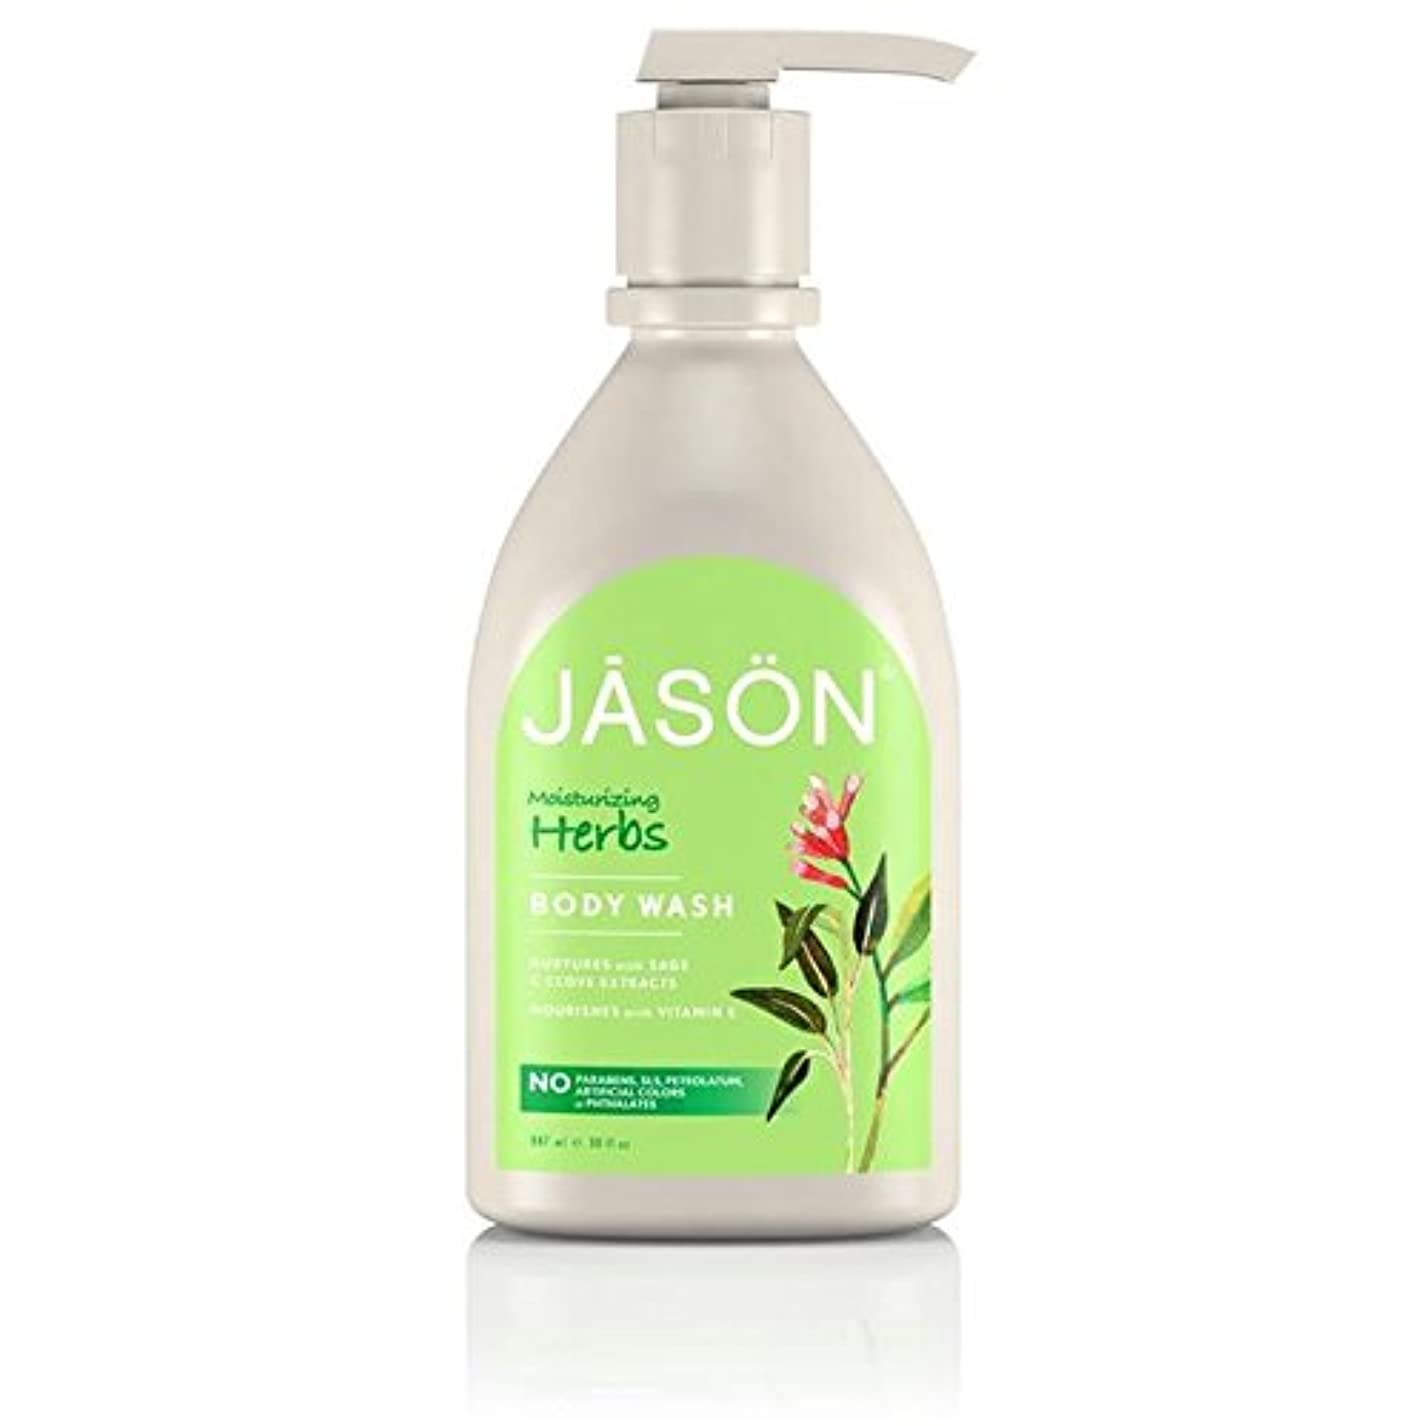 Jason Herbal Satin Body Wash Pump 900ml - ジェイソン?ハーブサテンボディウォッシュポンプ900ミリリットル [並行輸入品]